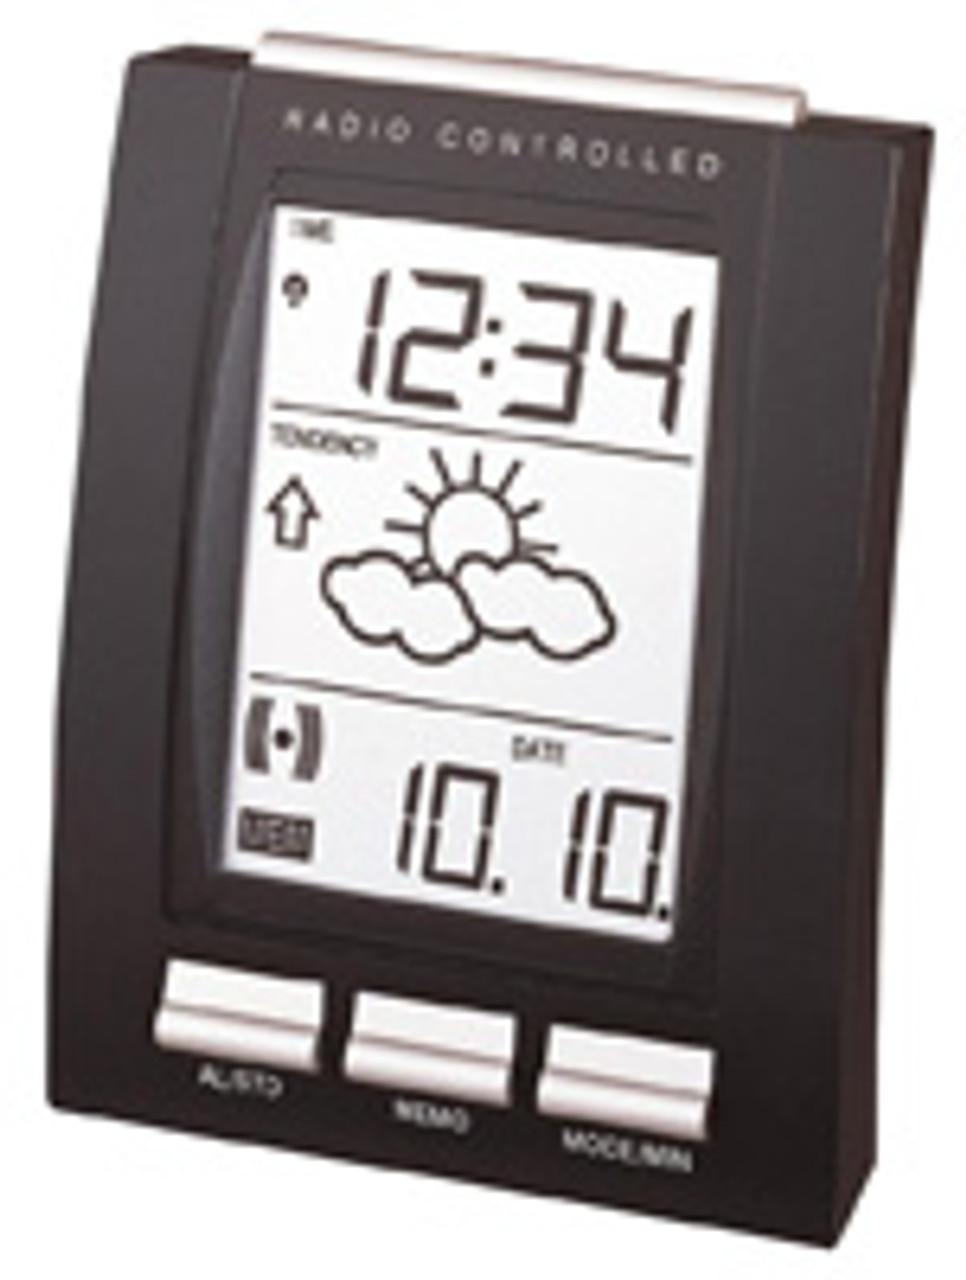 La Crosse WT293 Weather Forecast Memo Alarm Clock